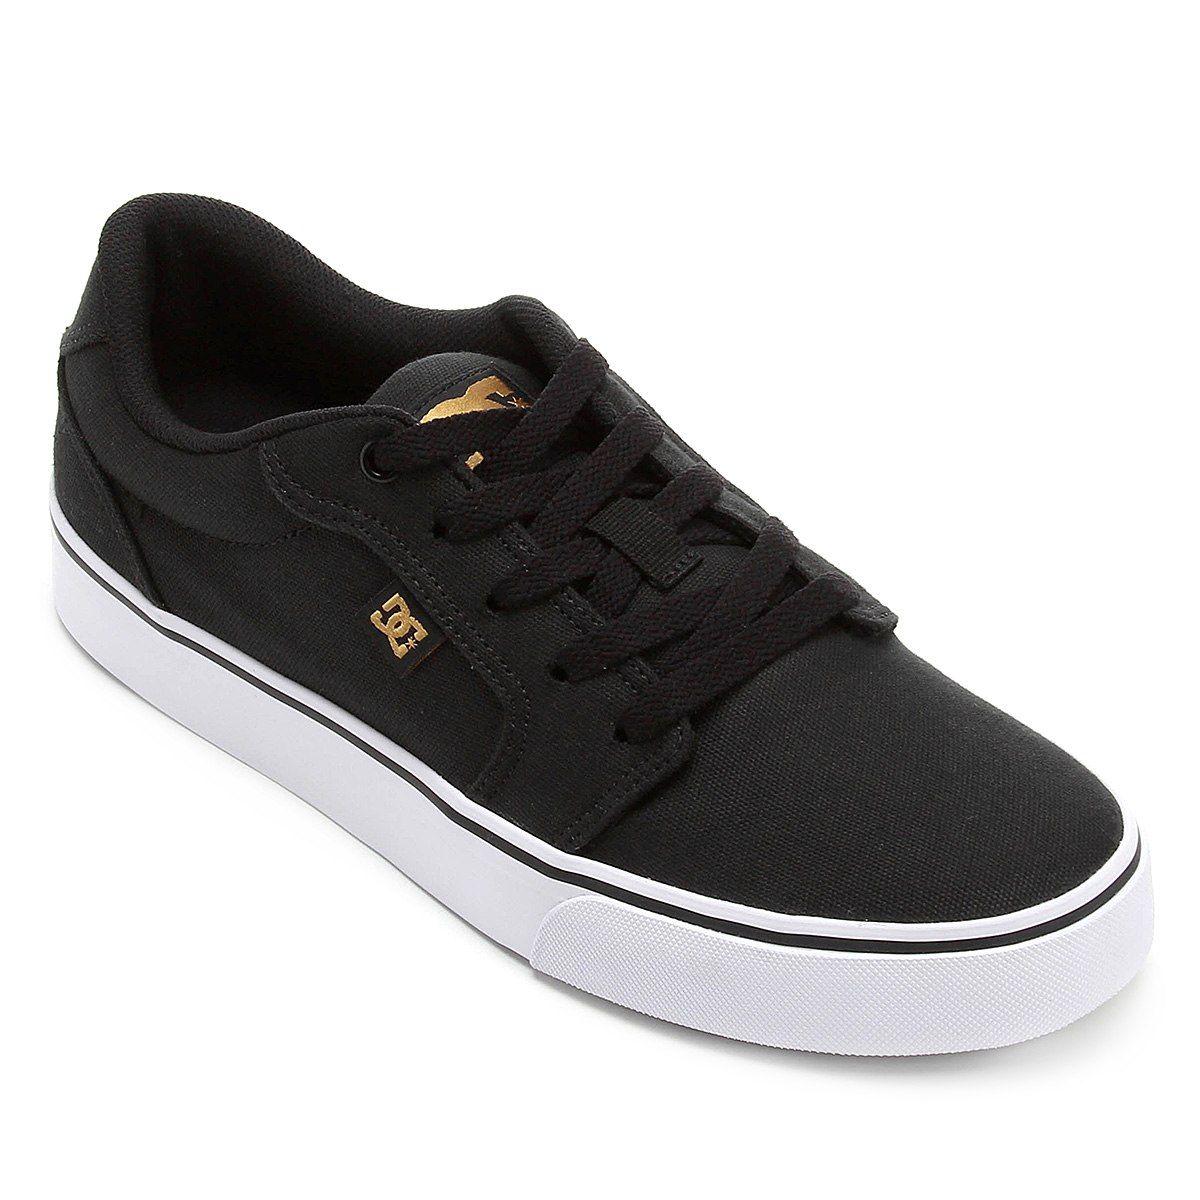 122d691f17b Tênis DC Shoes Anvil La Tx - Caramelo